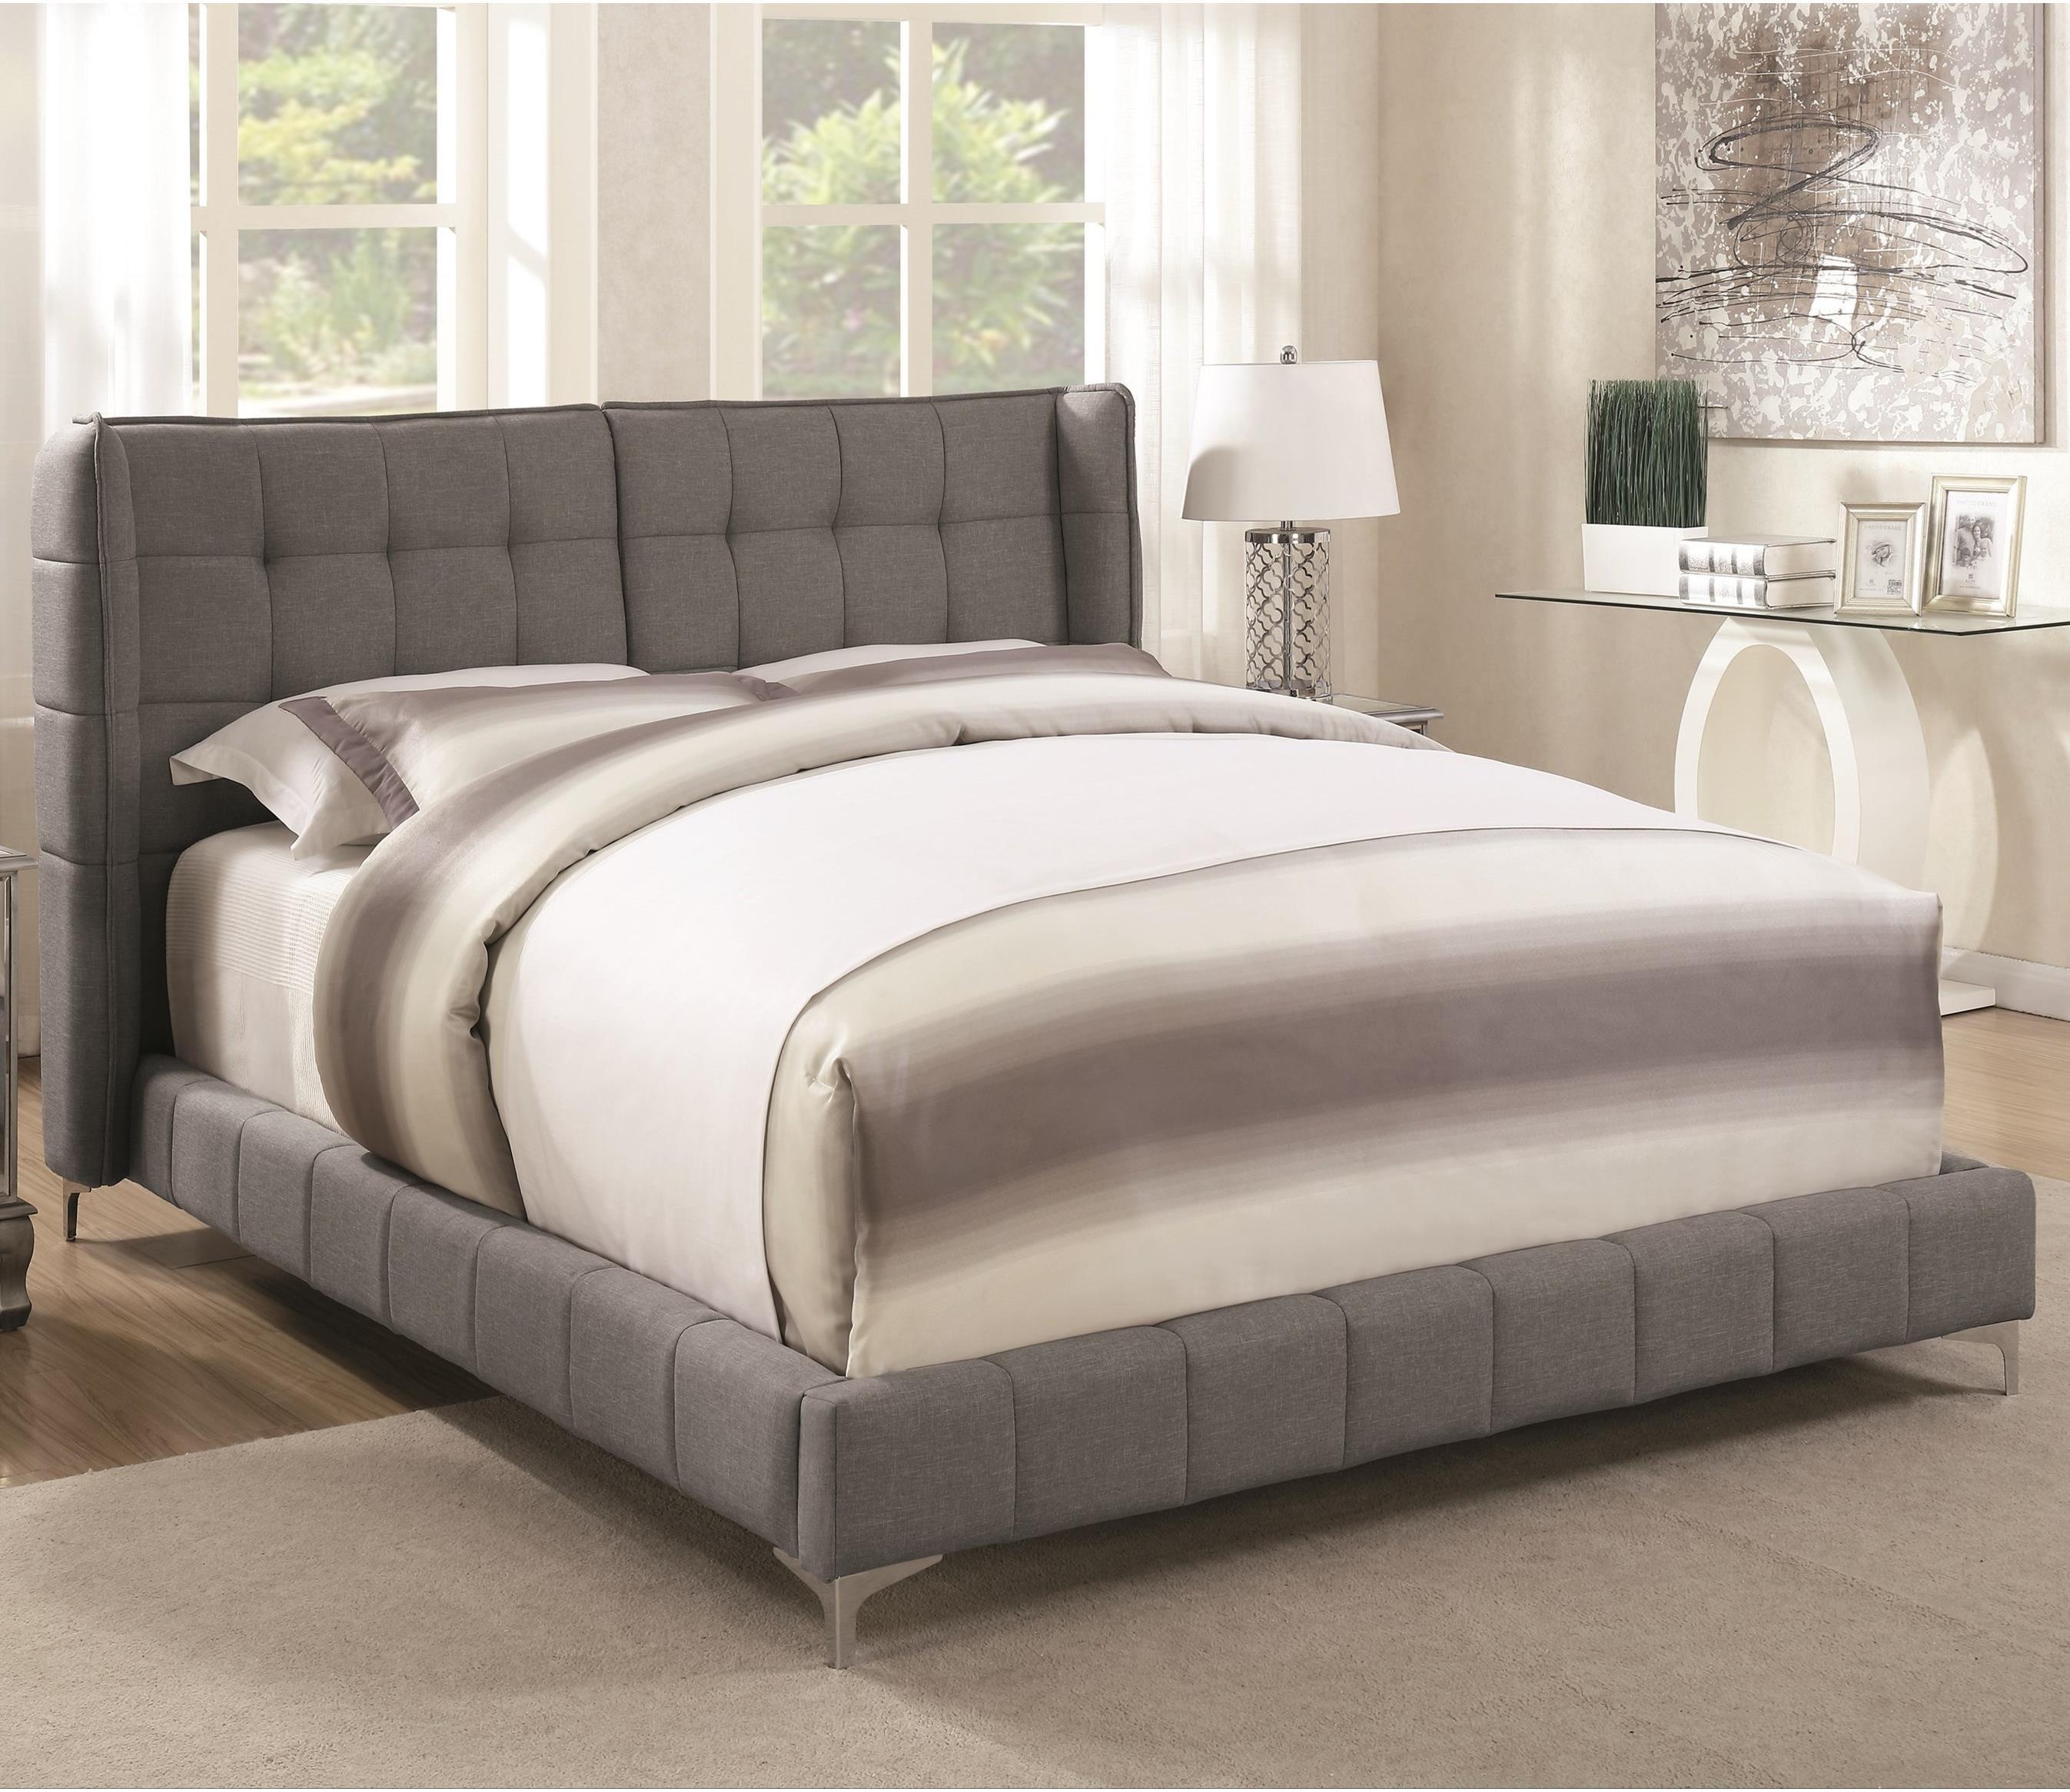 Coaster Goleta Full Upholstered Bed - Item Number: 300677F